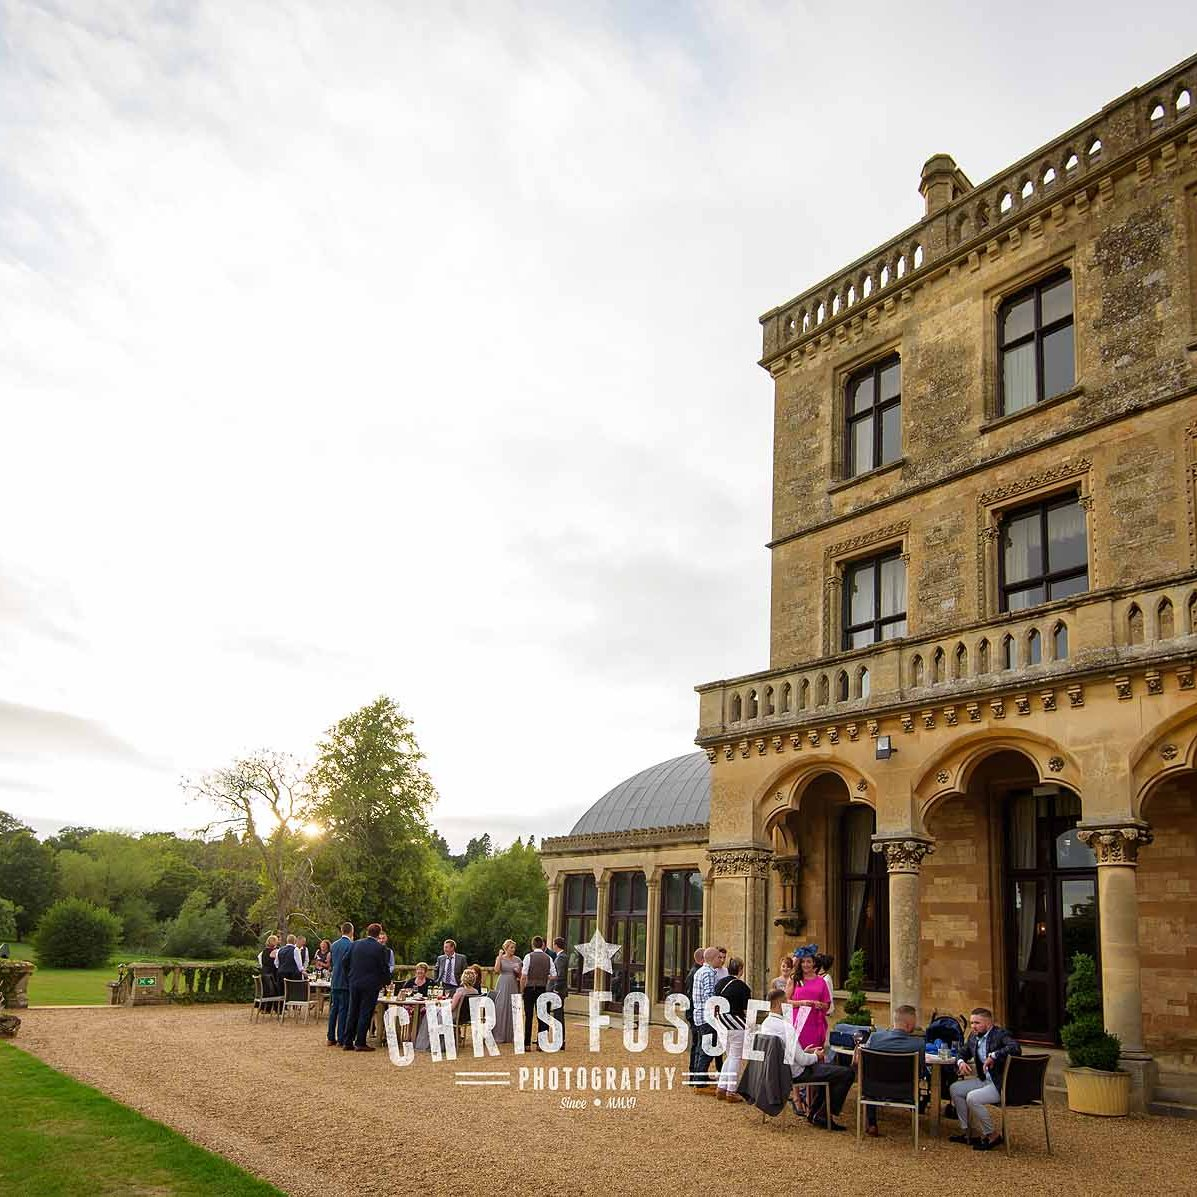 Mecure Warwickshire Walton Hall Summer Wedding Photography Warwickshire Kerry Aron (98 of 98)